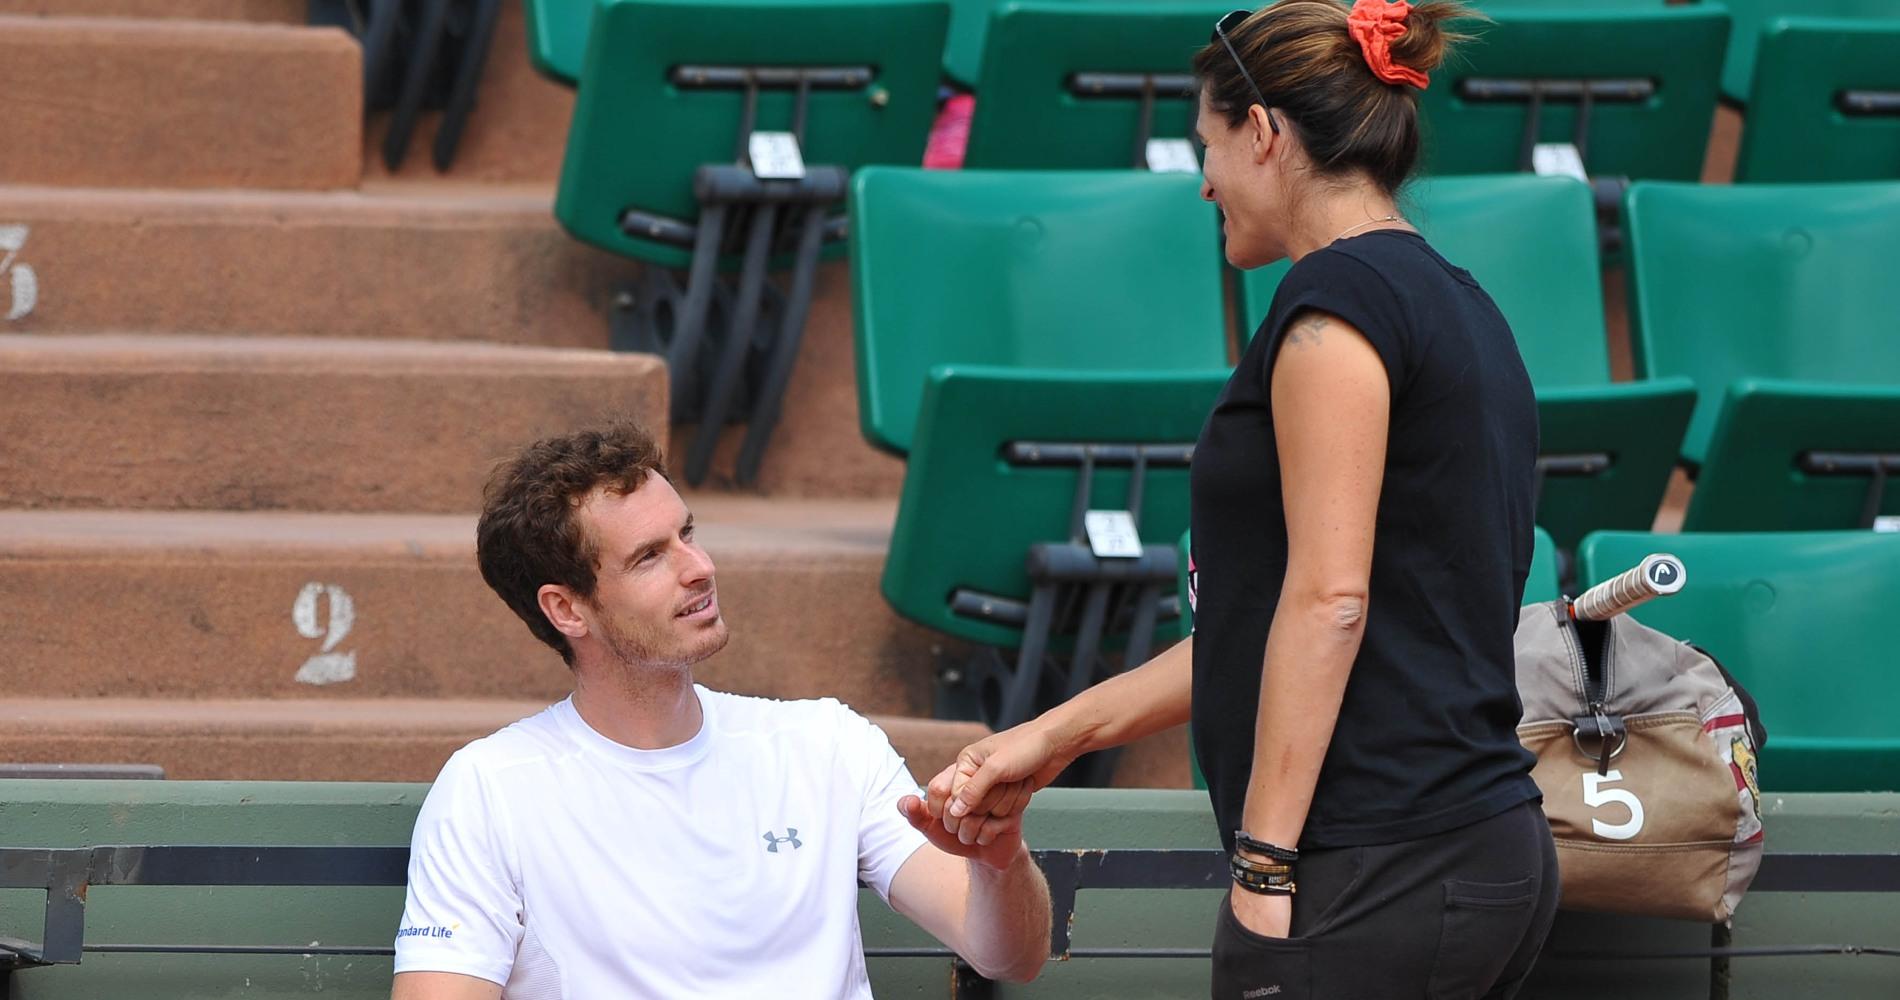 Amélie Mauresmo et Andy Murray, Roland-Garros 2015